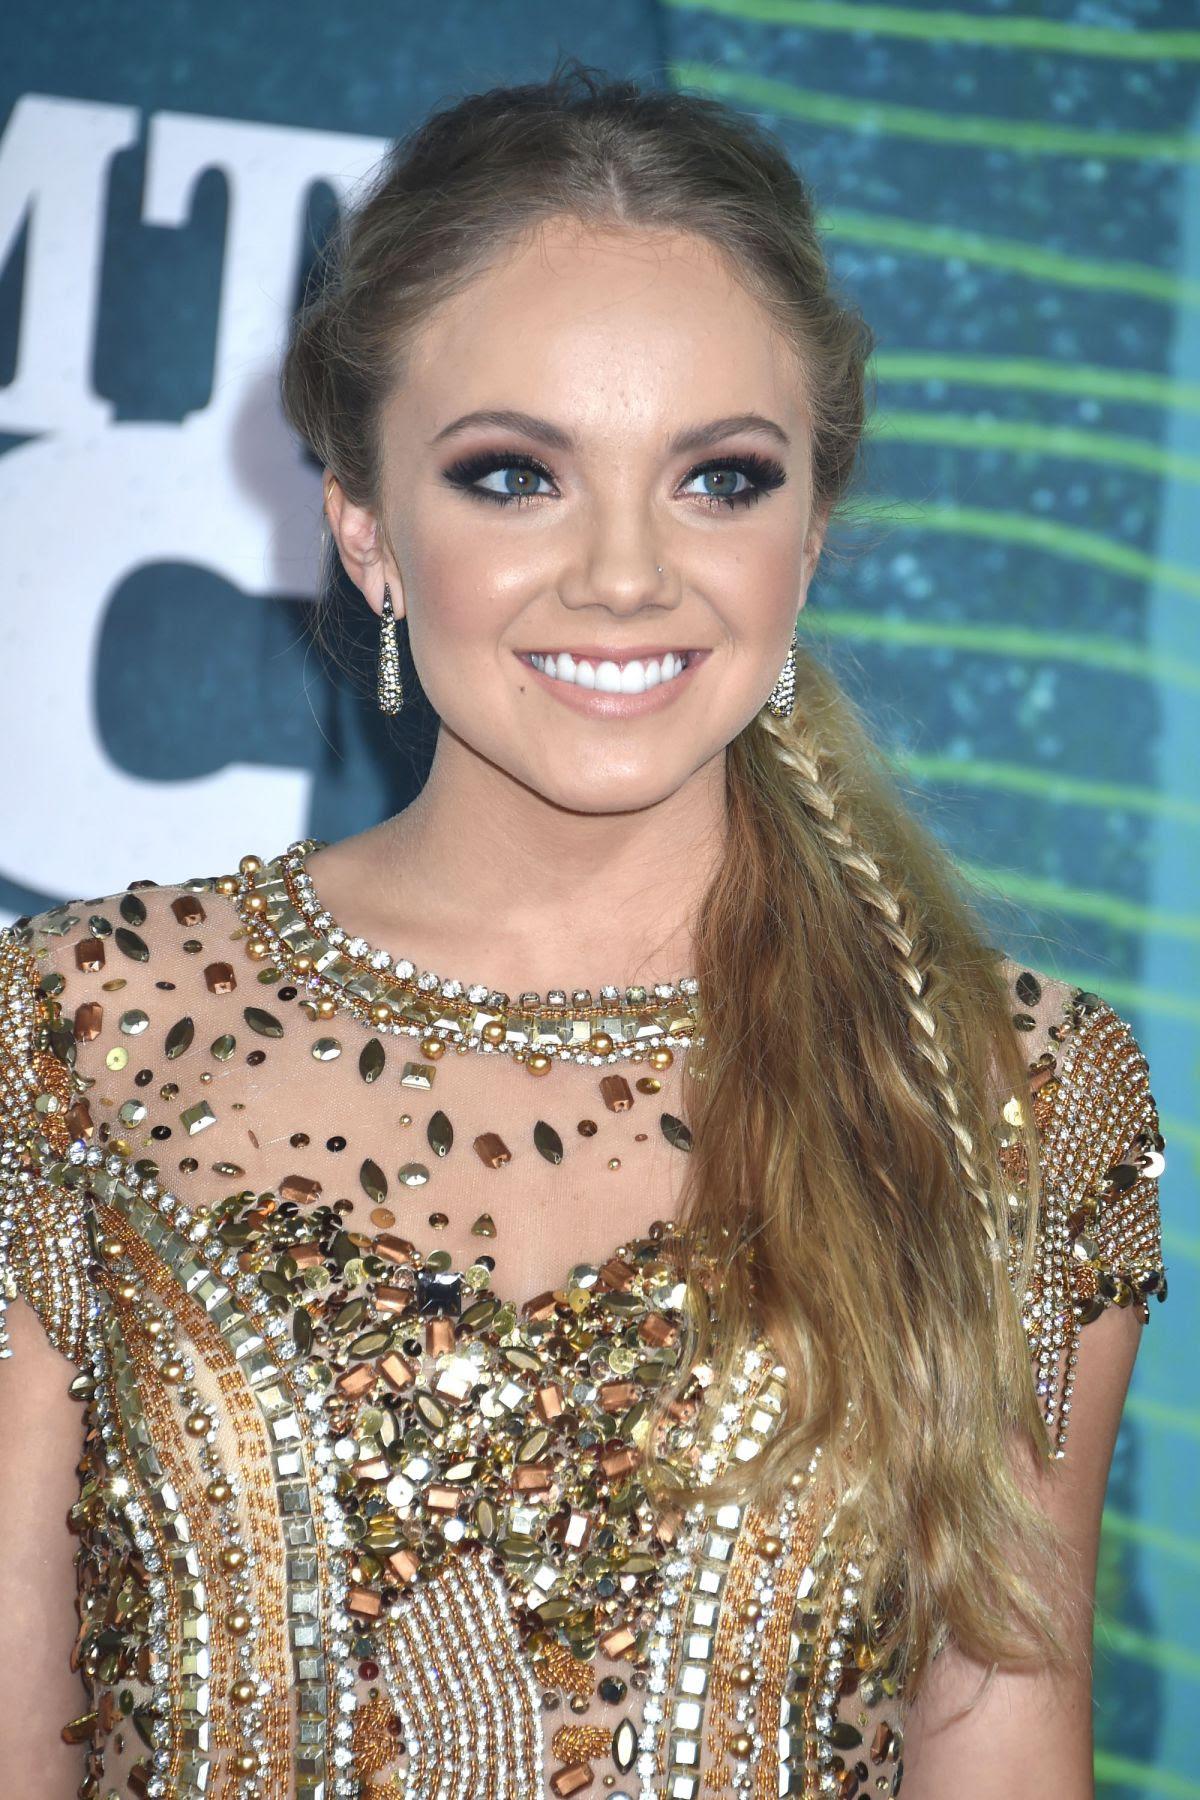 DANIELLE BRADBERY at 2015 CMT Music Awards in Nashville